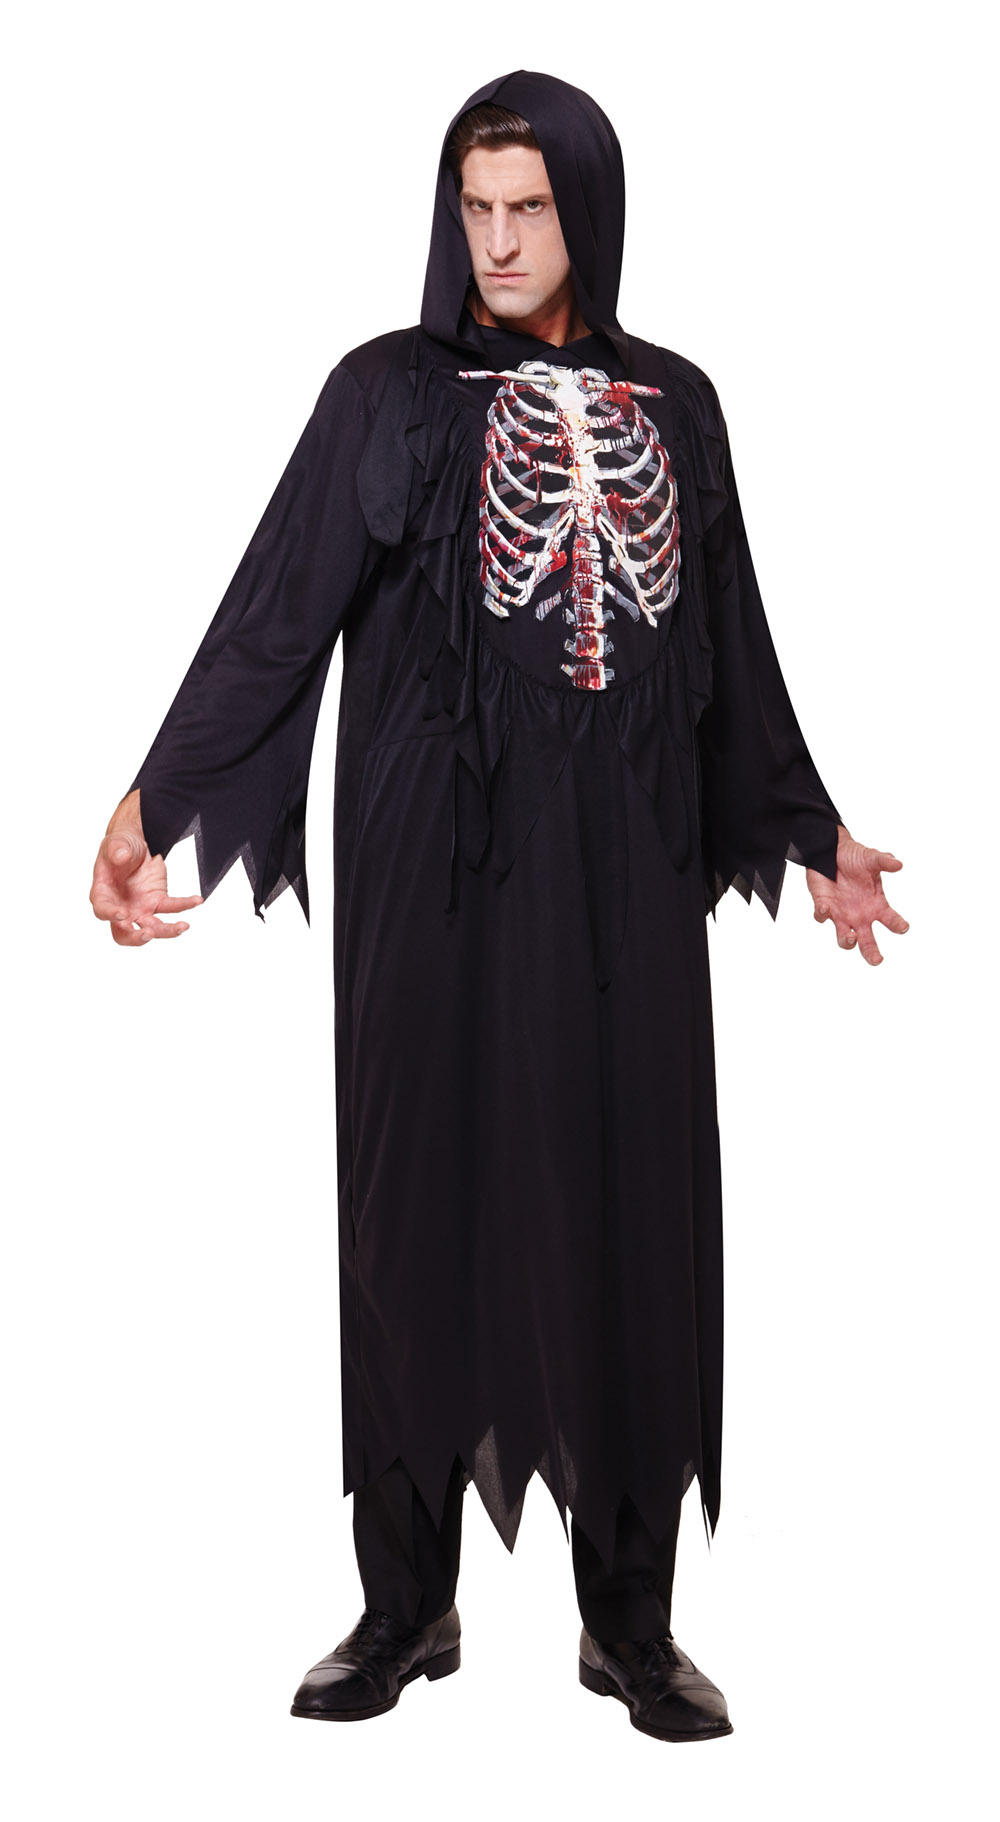 Skeleton Grim Reaper Costume